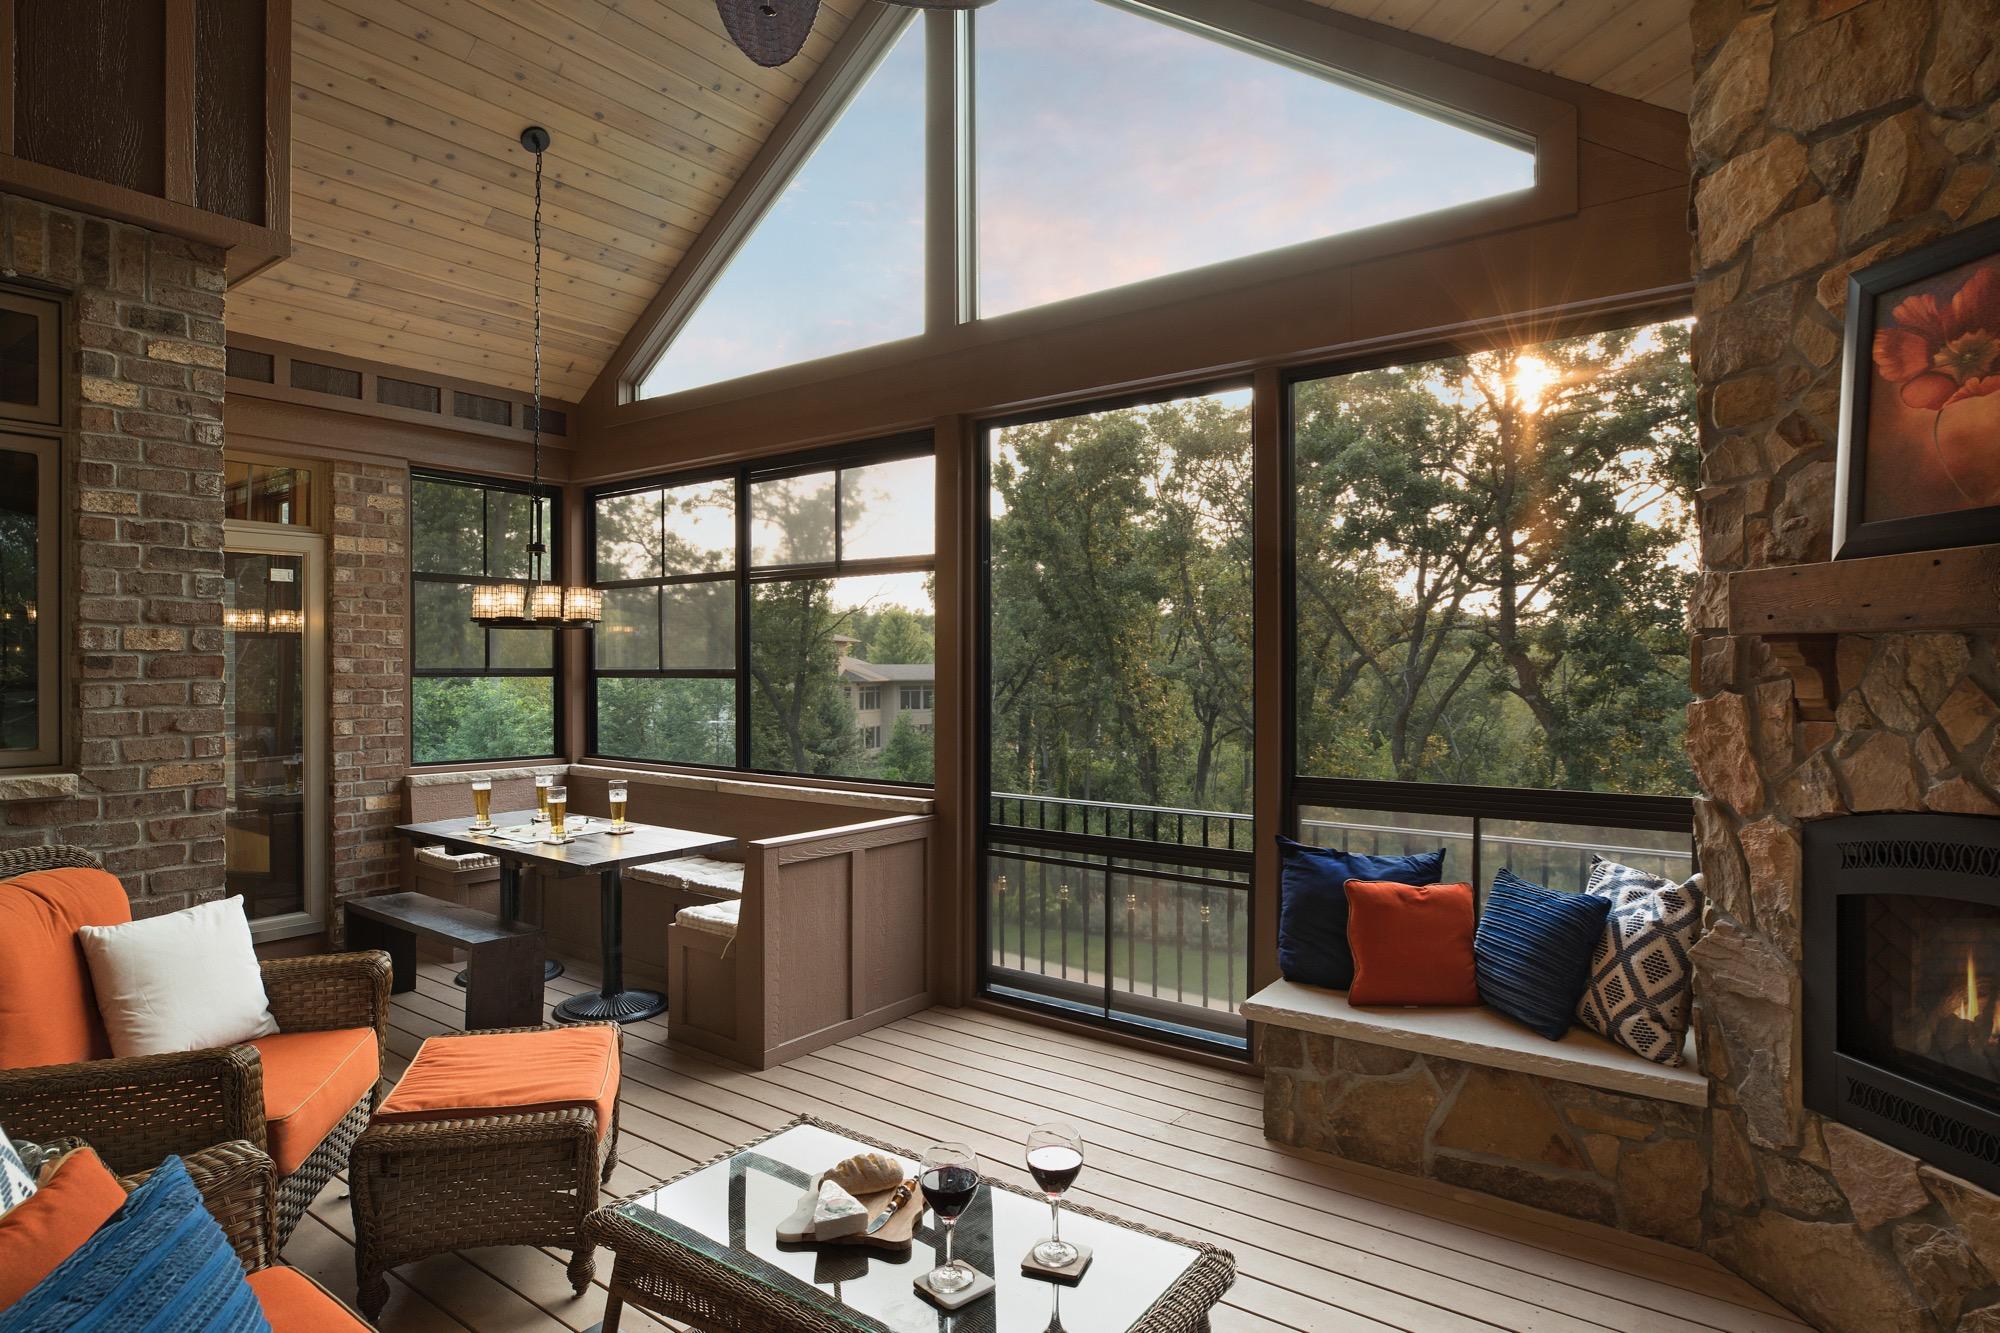 Moms Design Build - 4 Season Porch